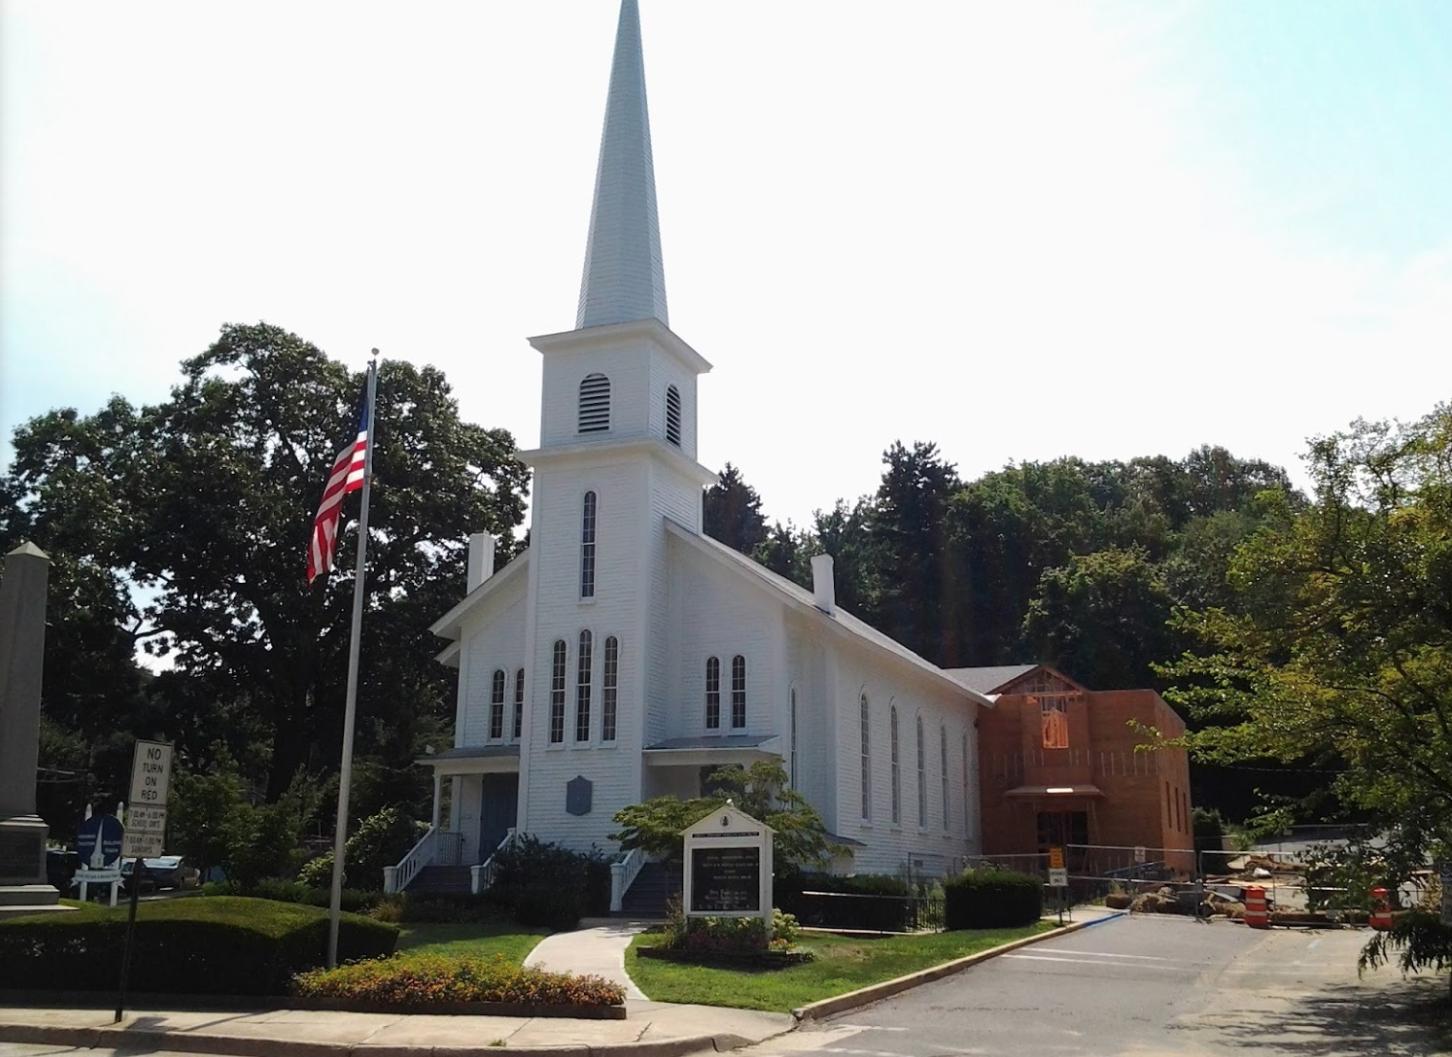 NORTHPORT CHURCH